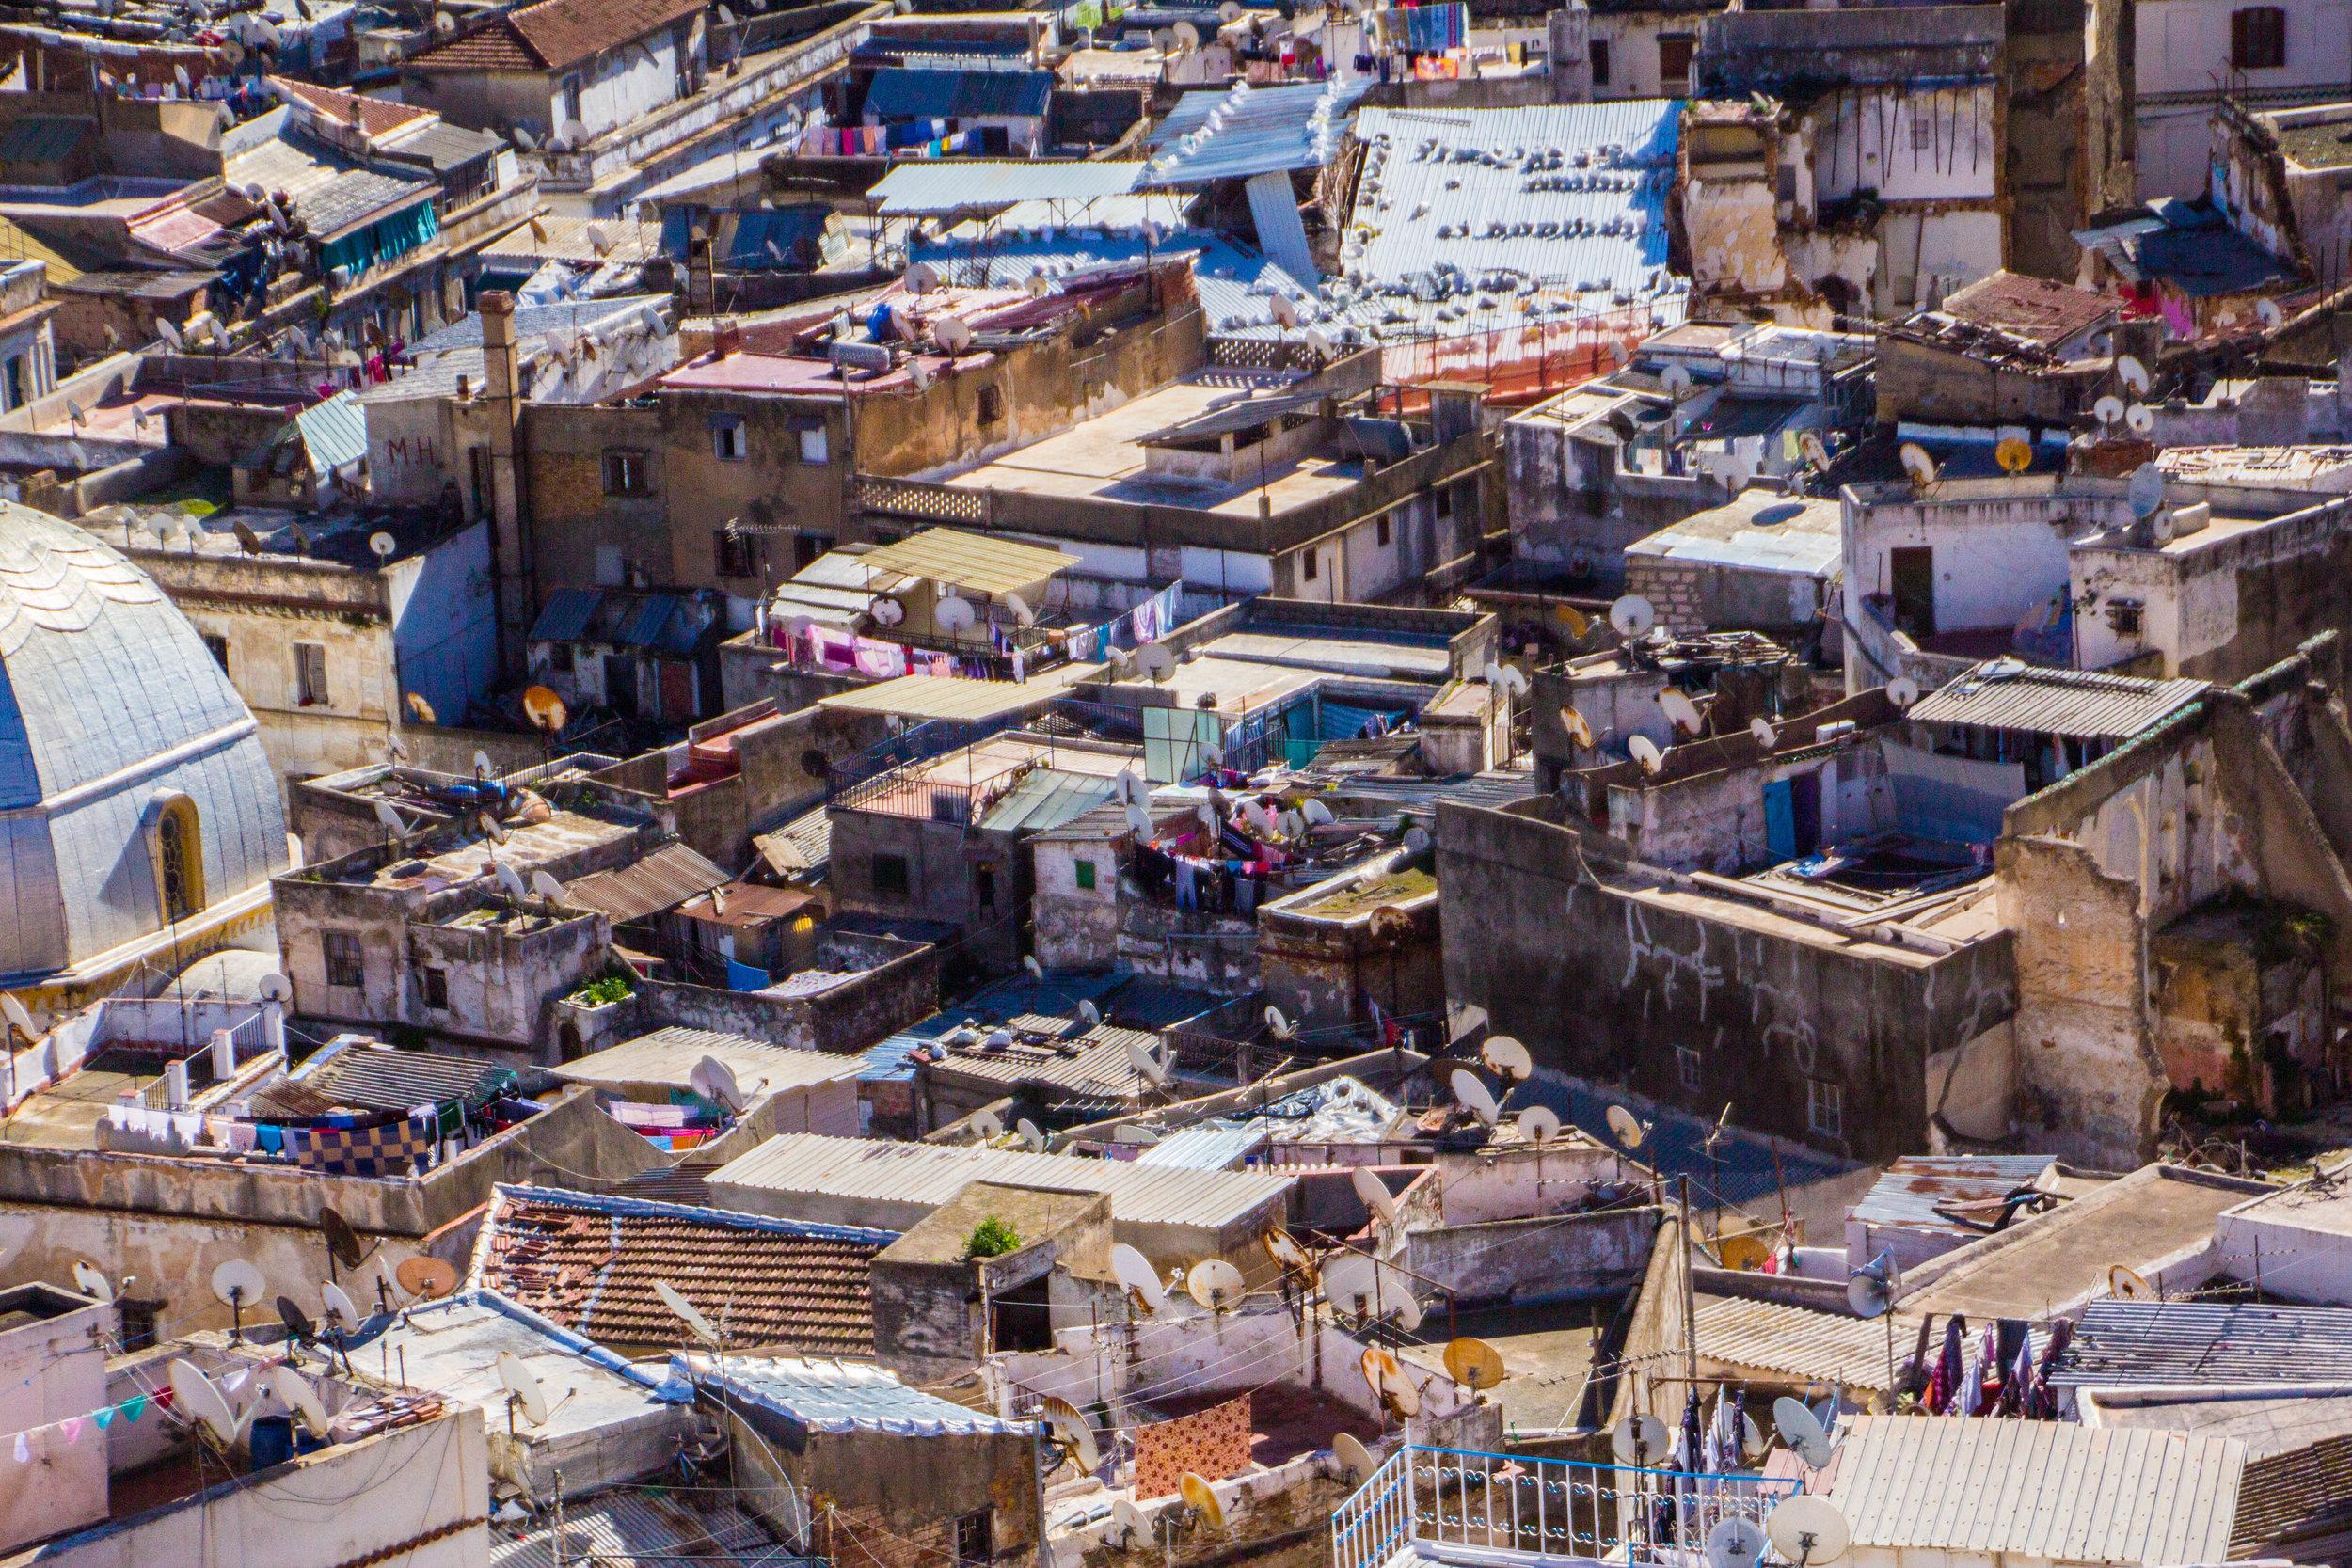 casbah-from-above-algiers-algeria-9.jpg